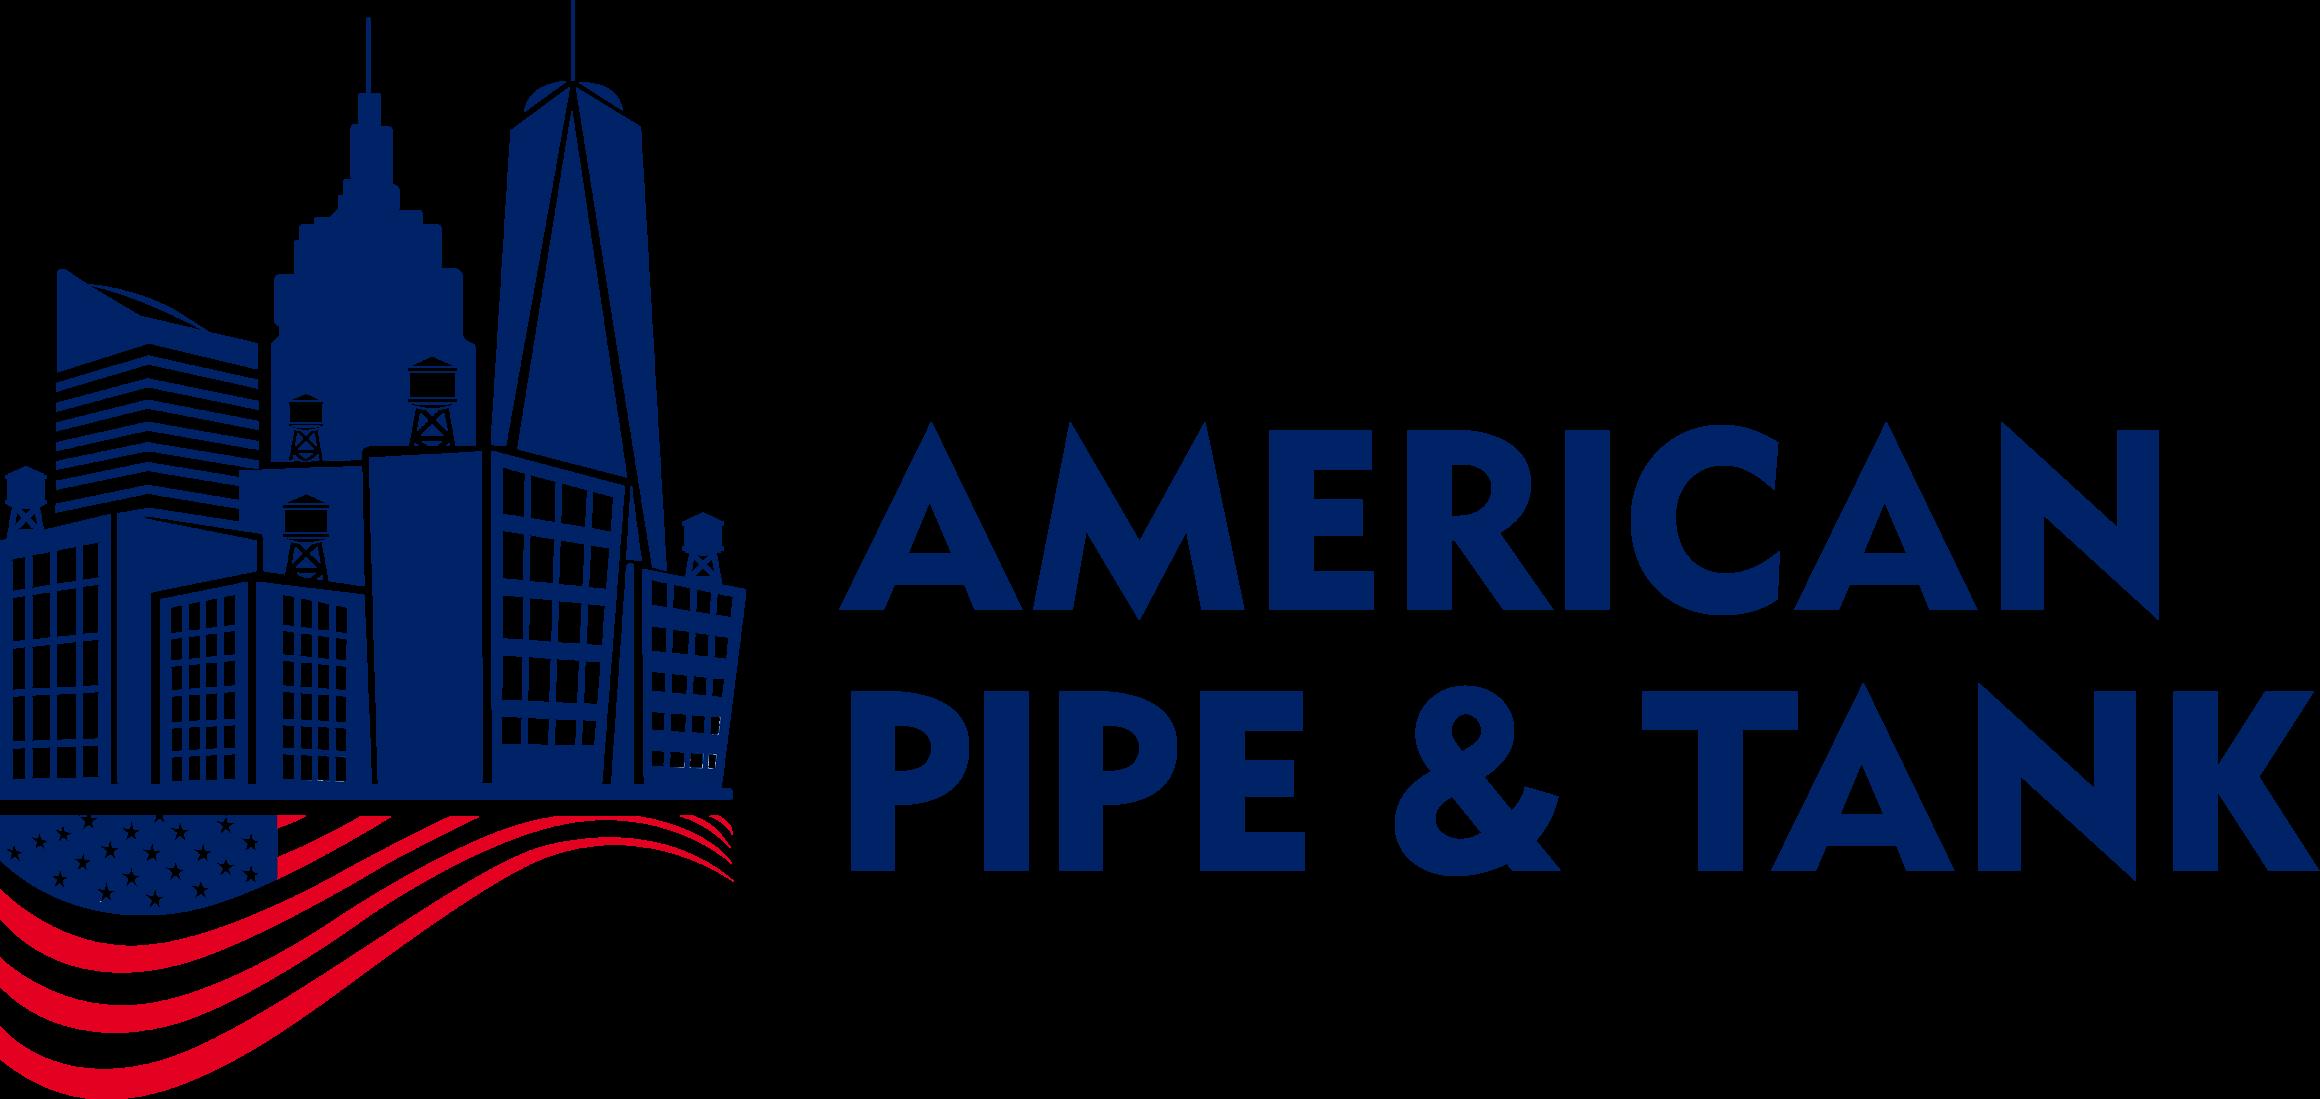 American Pipe & Tank